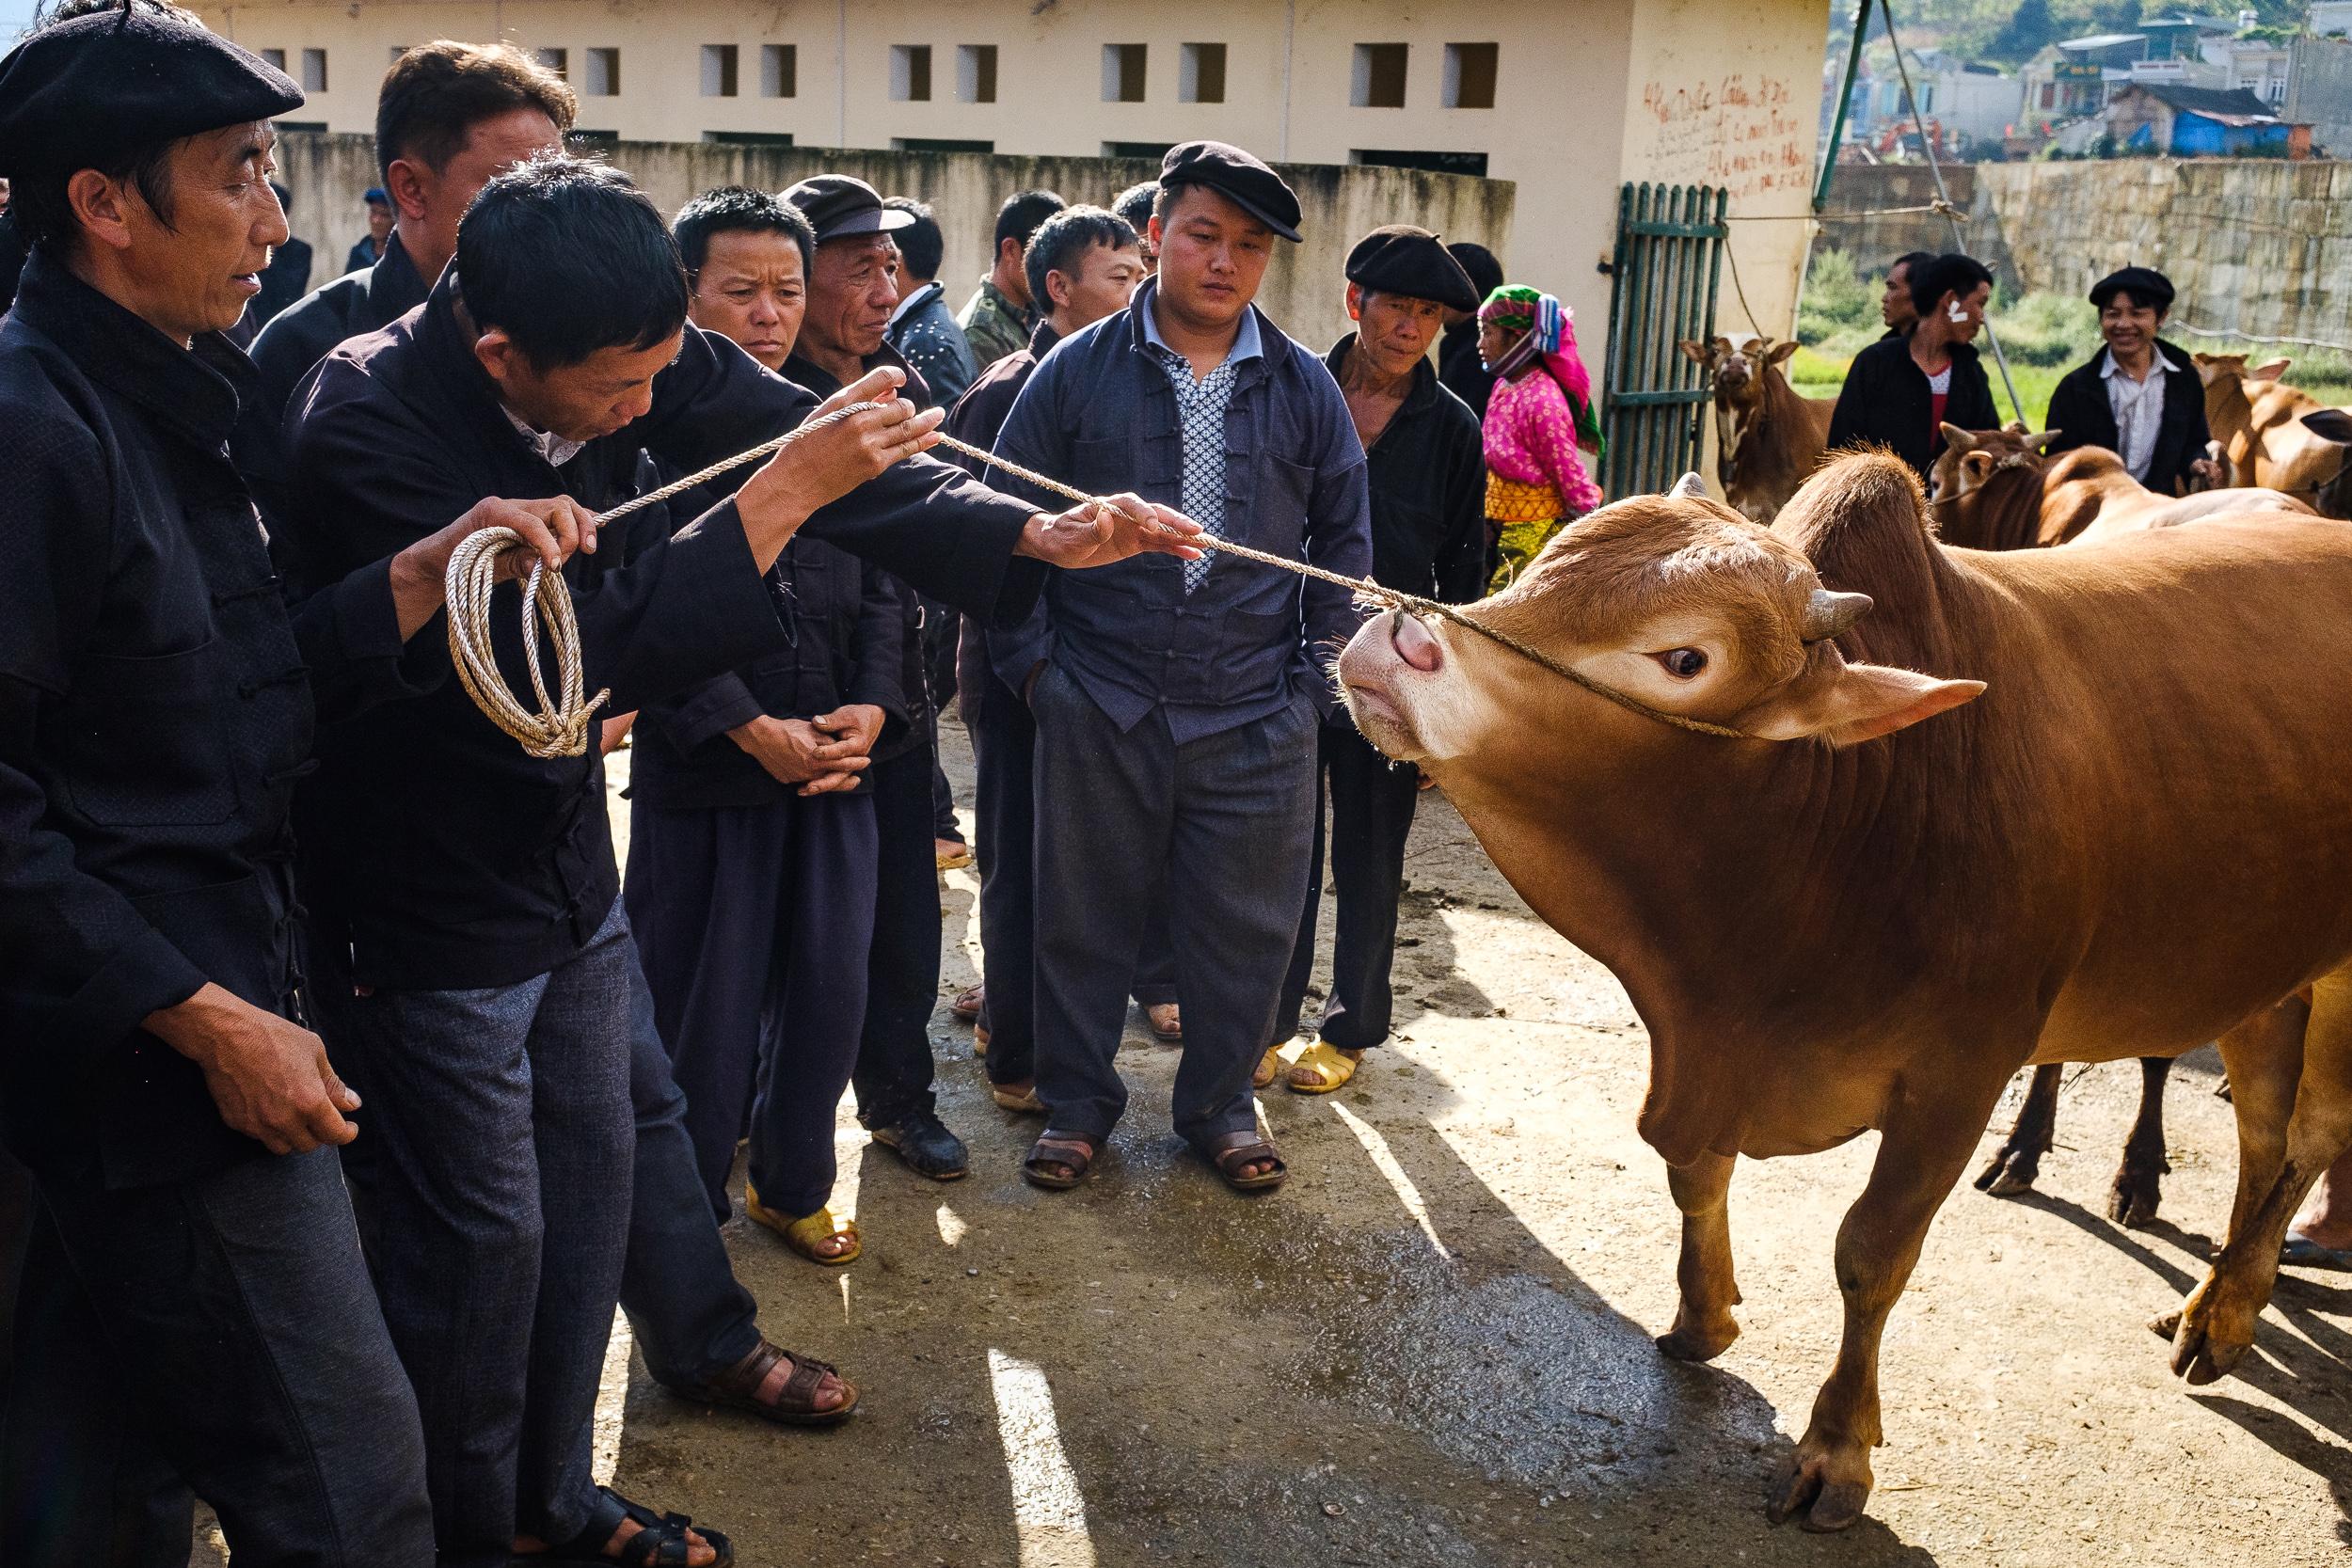 A potential buyer examining a livestock for sale in Dong van market in Northern vietnam